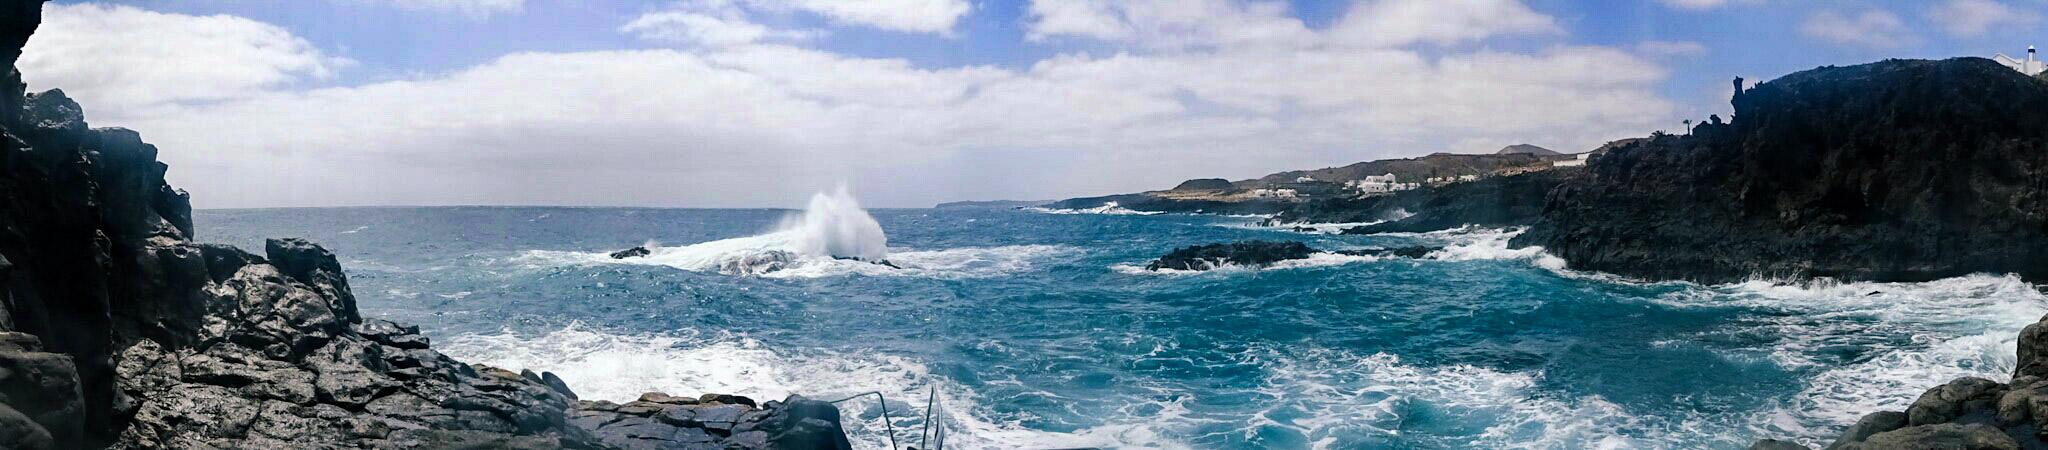 Sturm im Wasserglas Atlantik